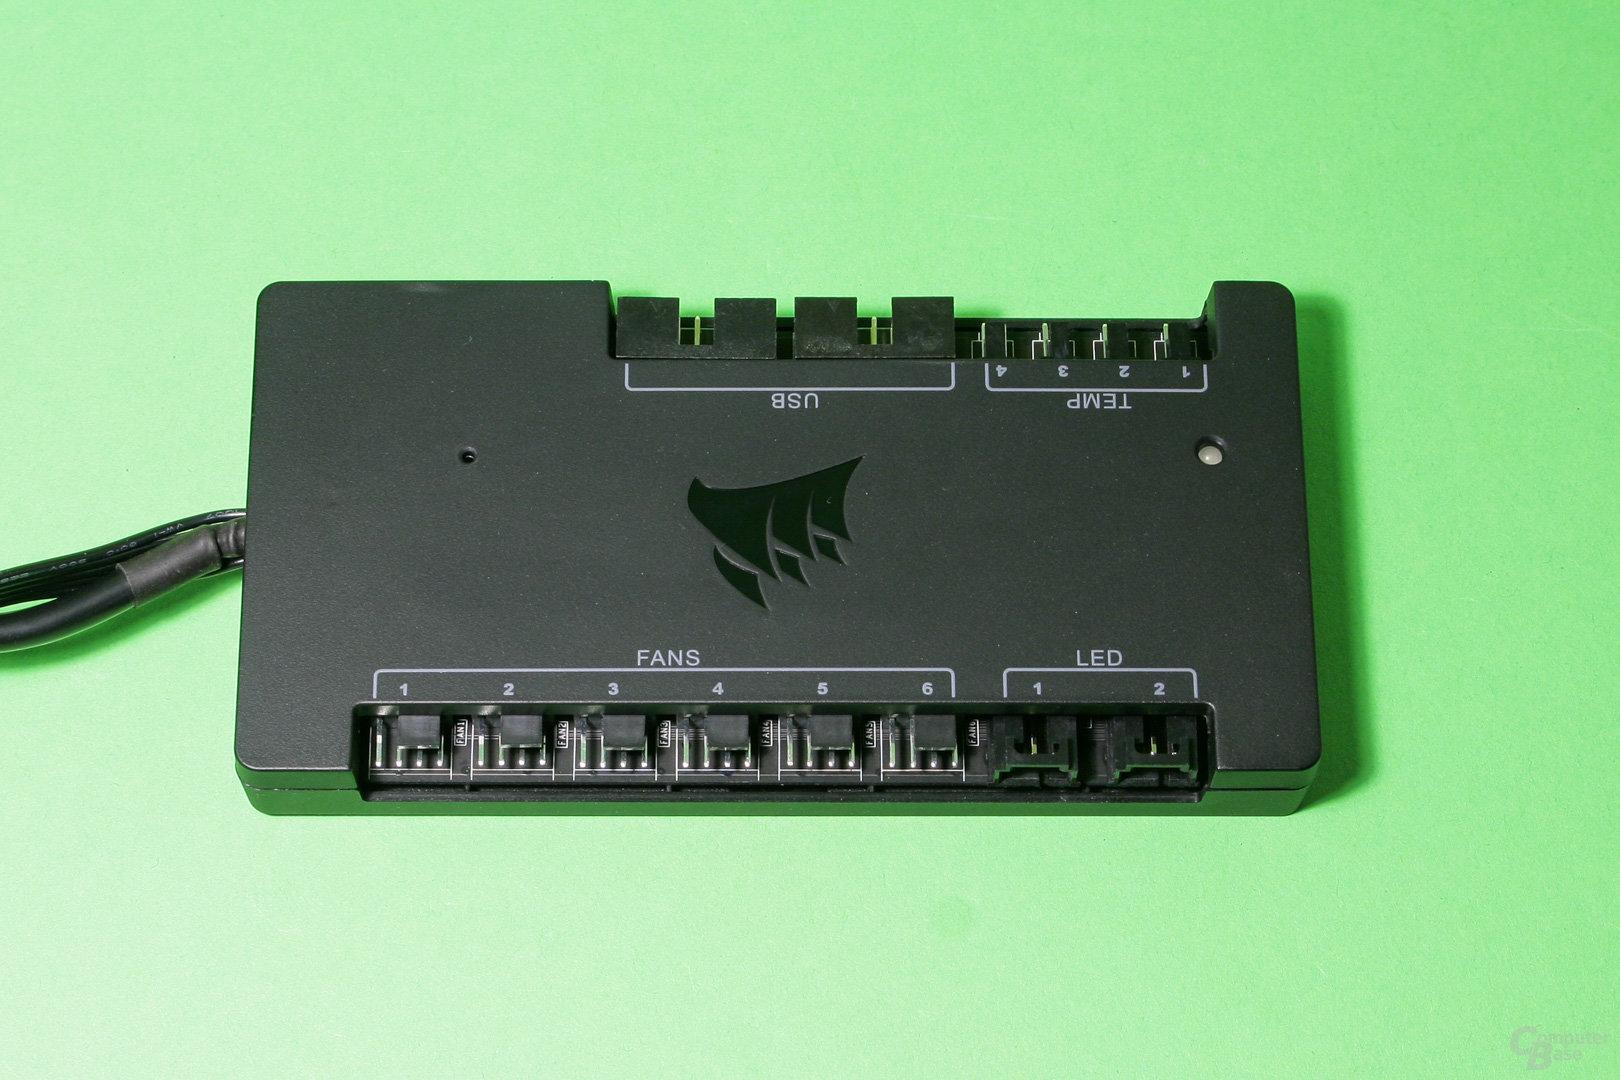 Corsair Commander Pro: Sechs Lüfteranschlüsse und zwei RGB-LED-Anschlüsse